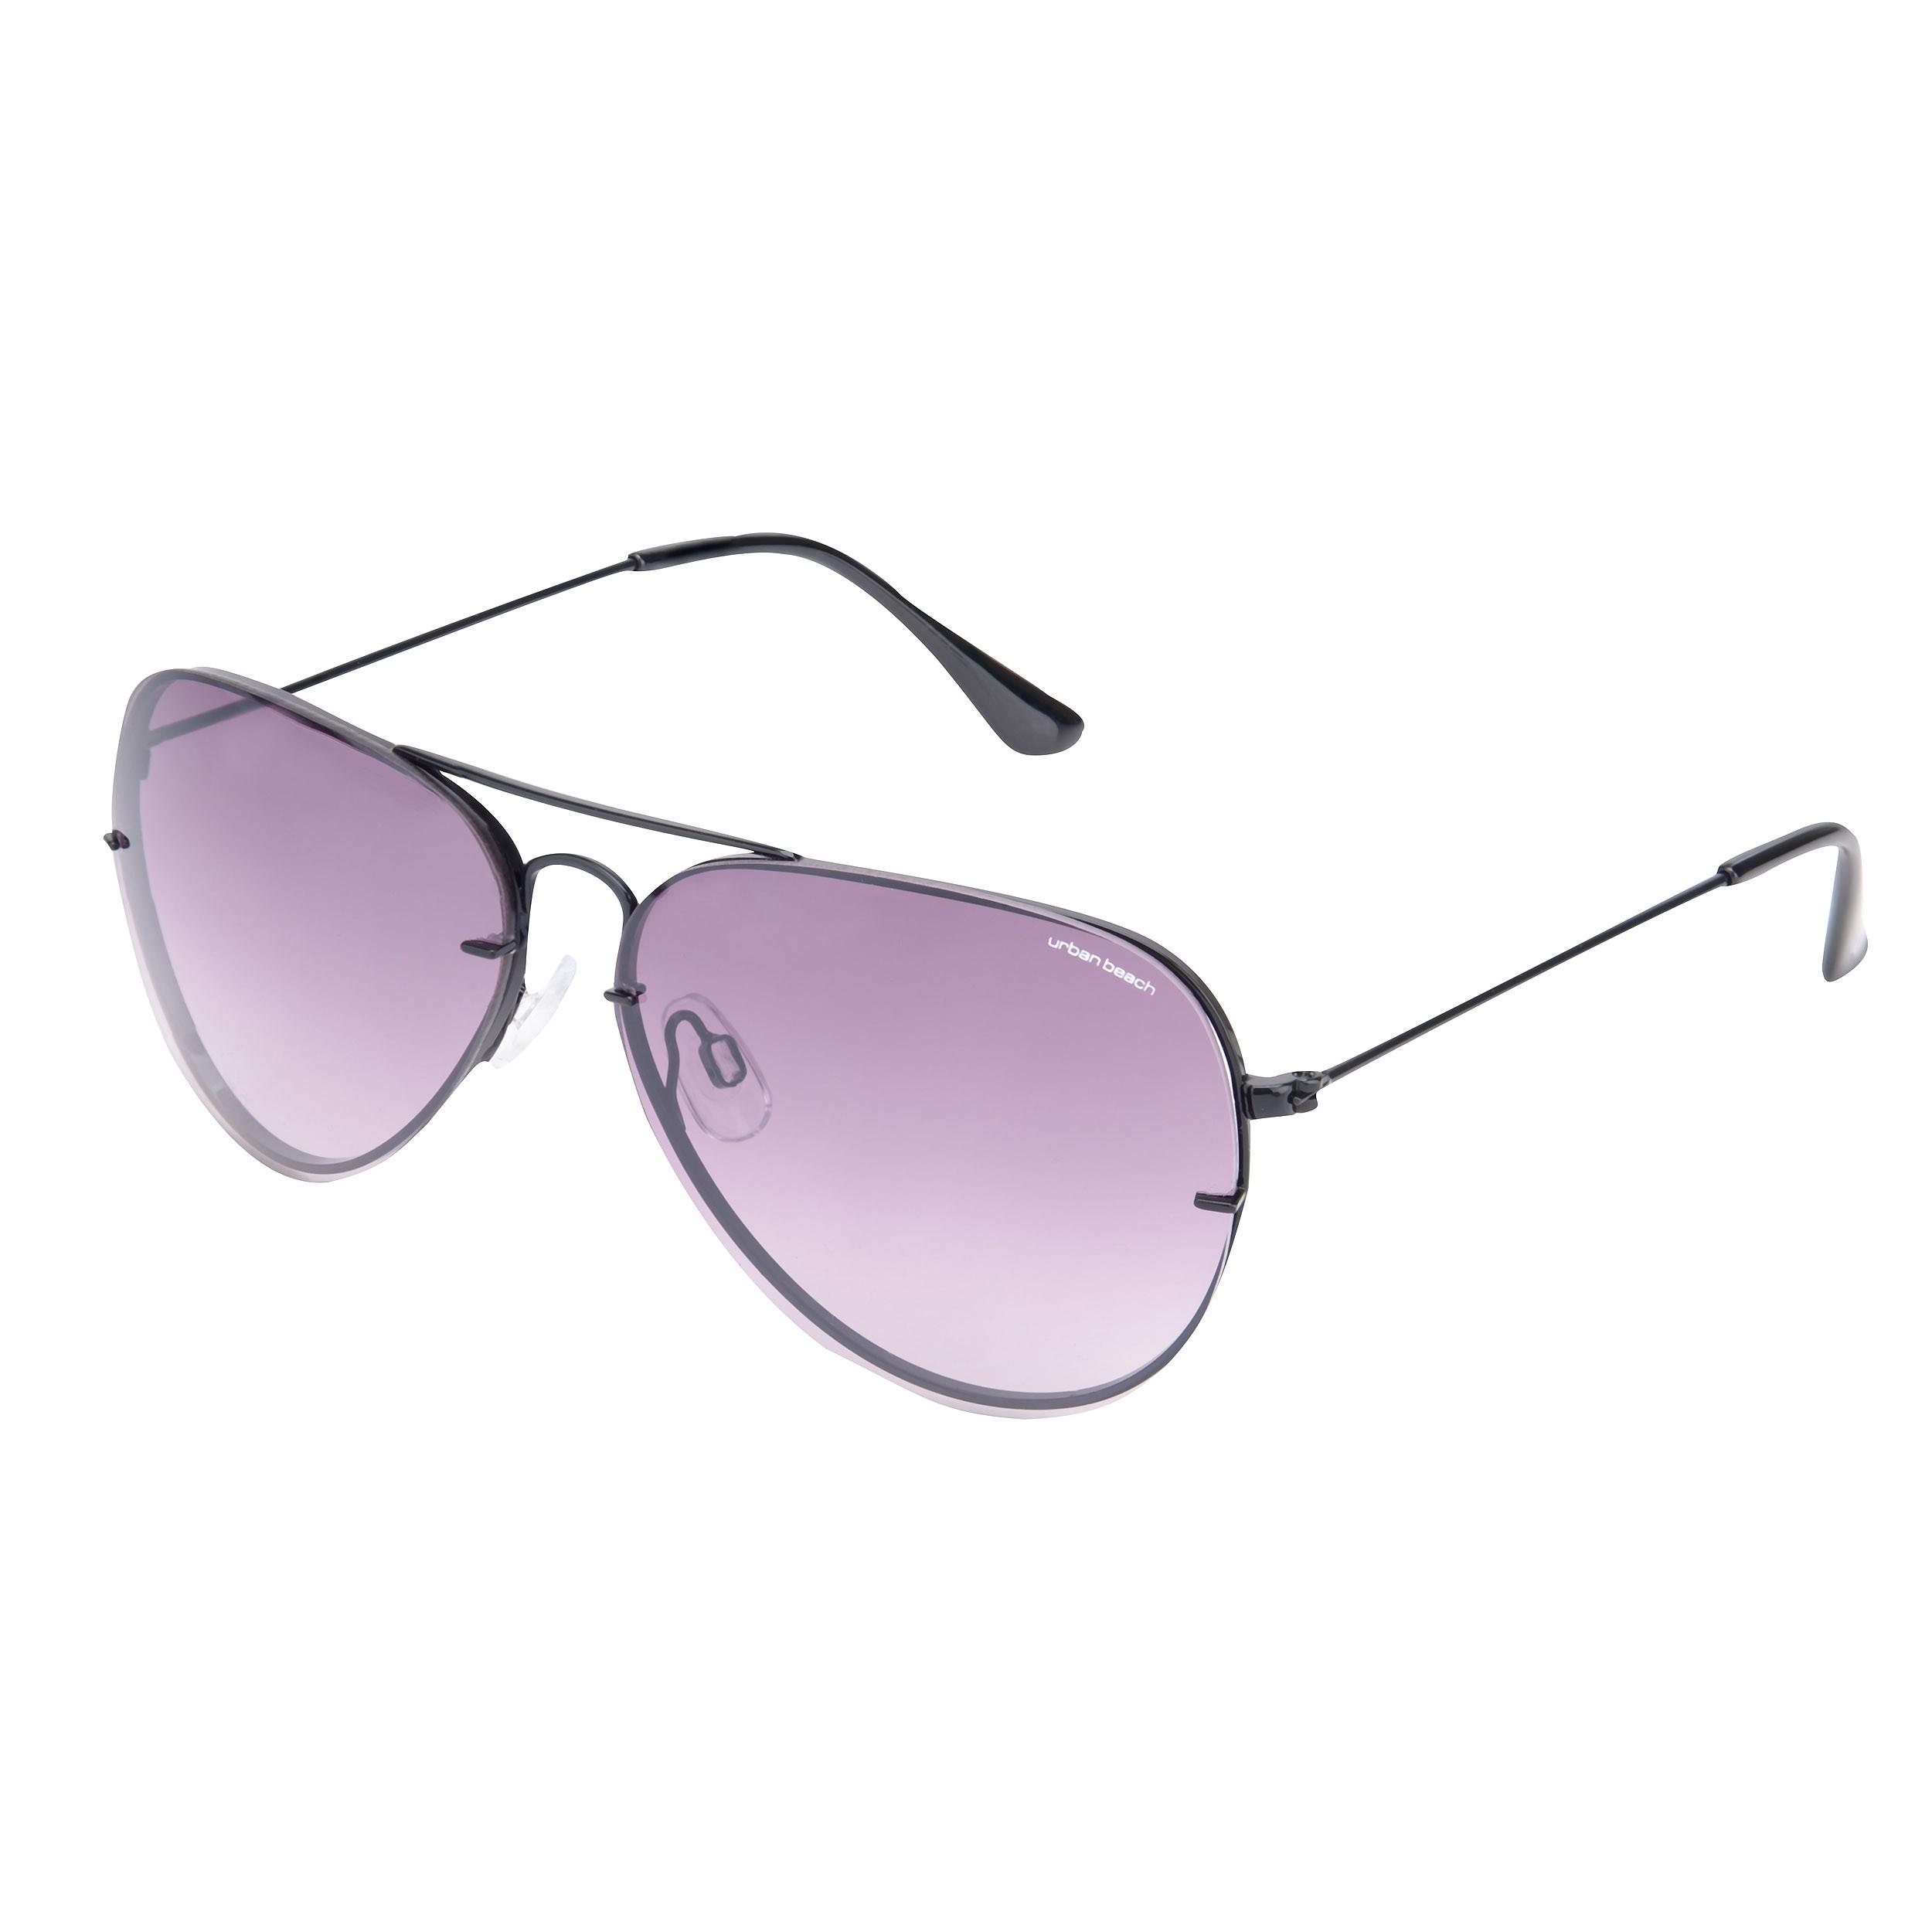 Unisex Black Sunset Aviator Sunglasses